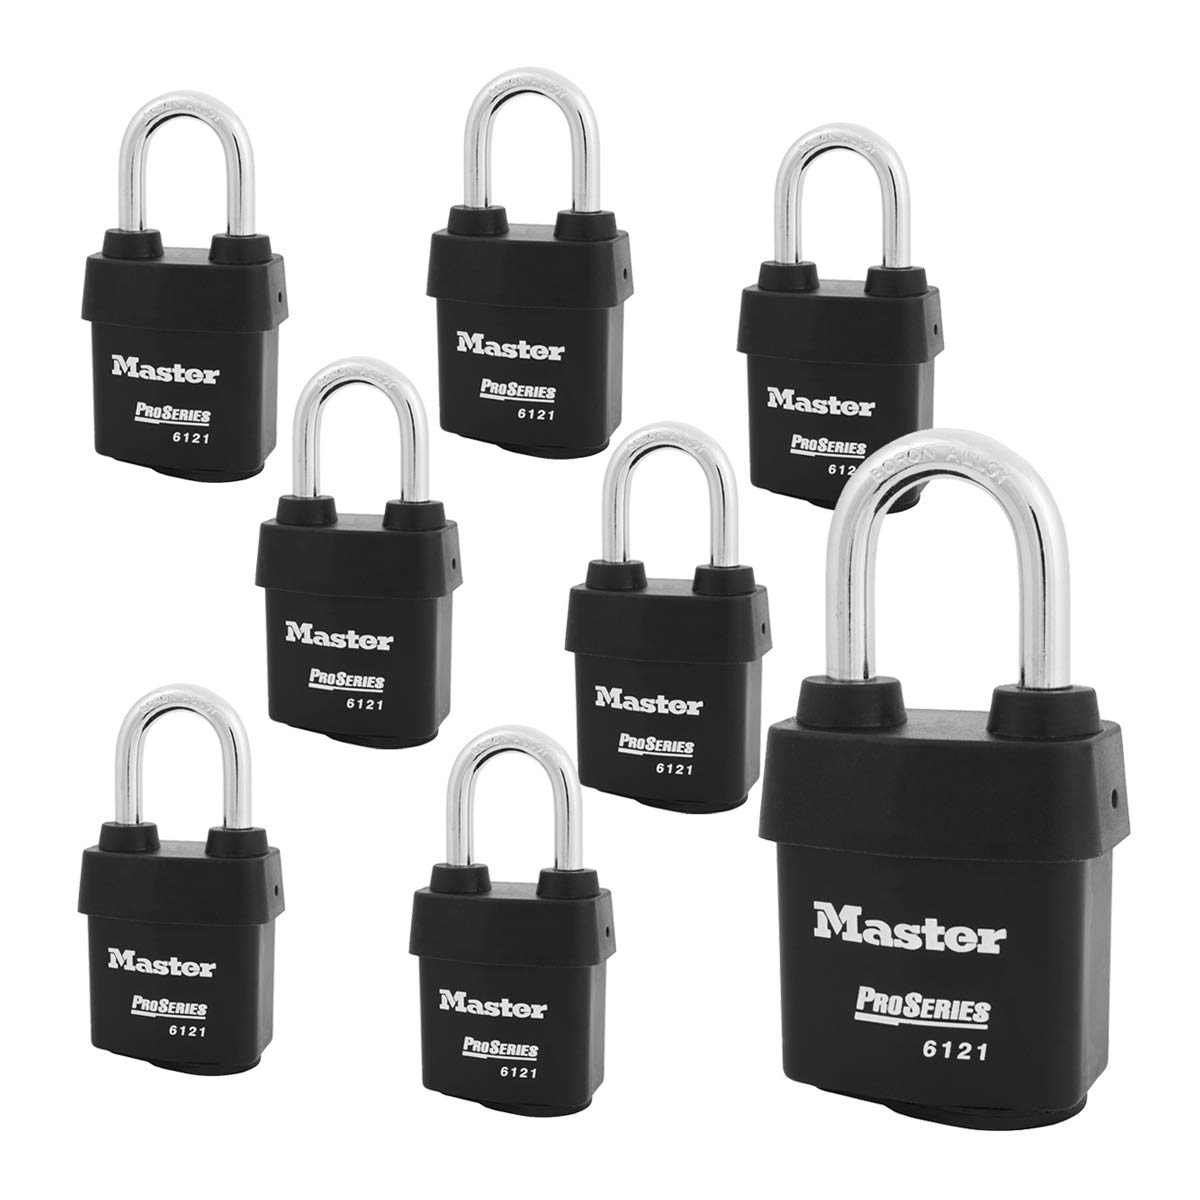 Master Lock - Eight (8) High Security Pro Series Padlocks 6121NKALF-8 w/BumpStop Technology by Master Lock